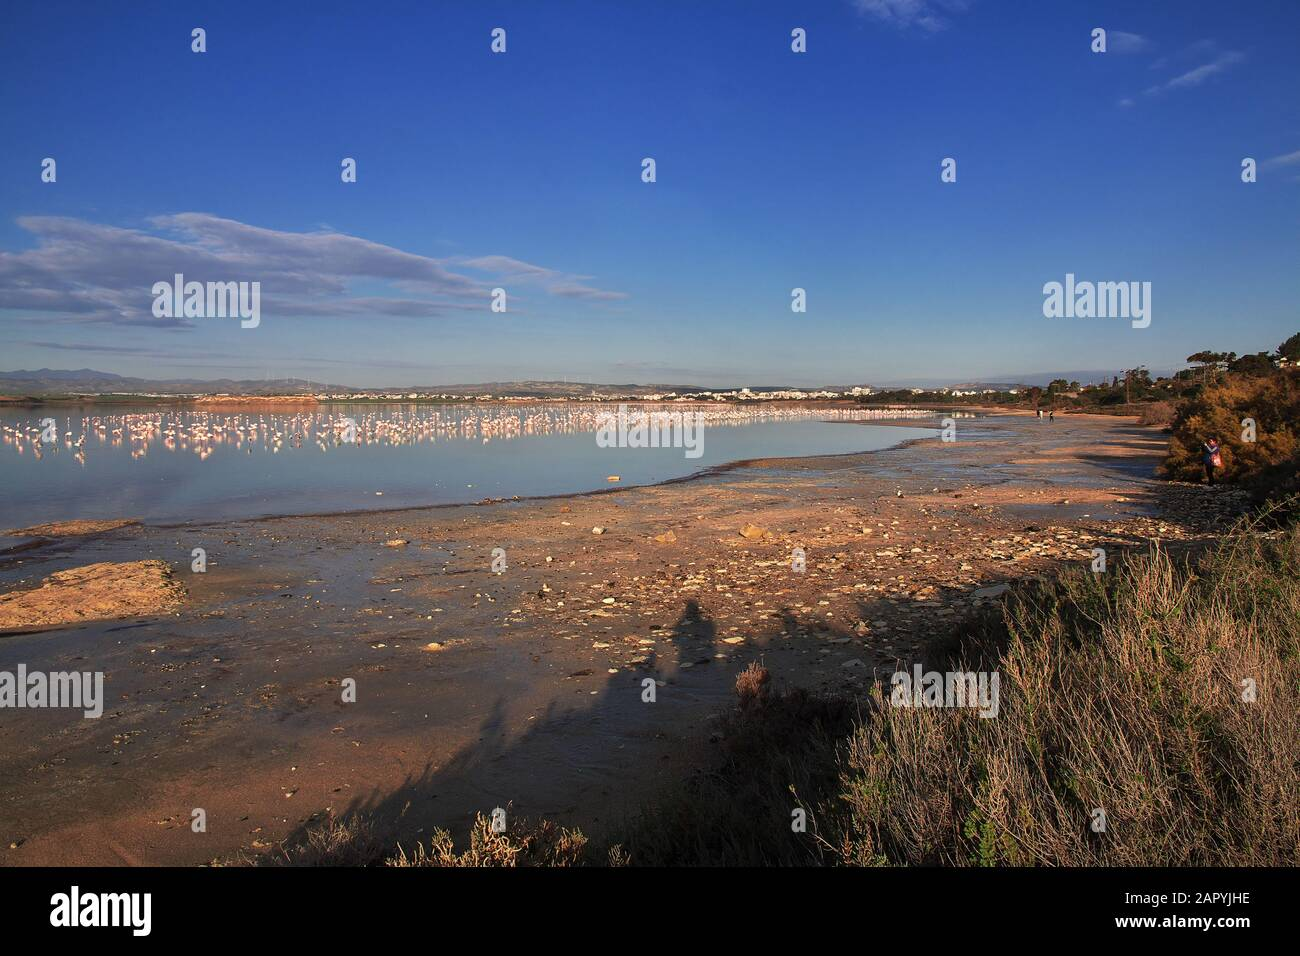 Flamingo on salt lake in Larnaca, Cyprus Stock Photo